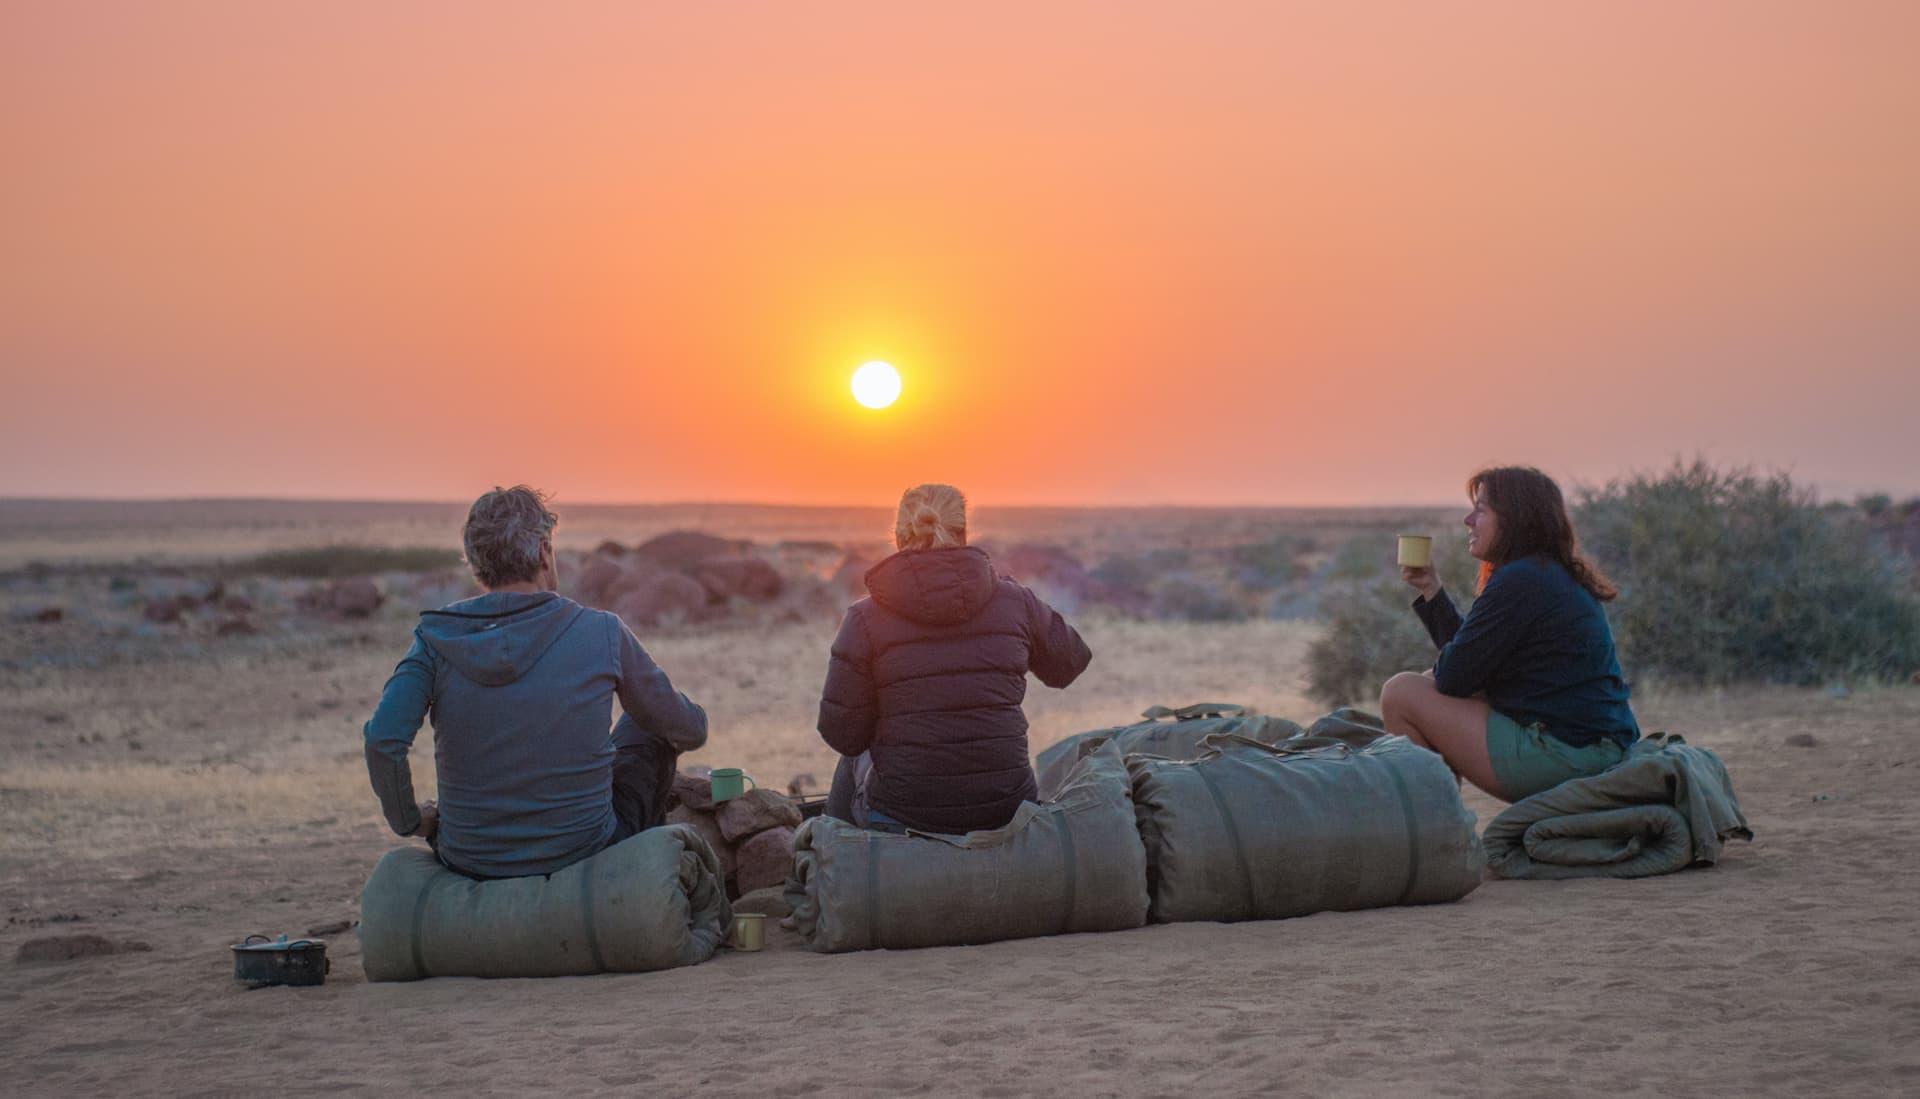 Volunteers in the desert in Namibia